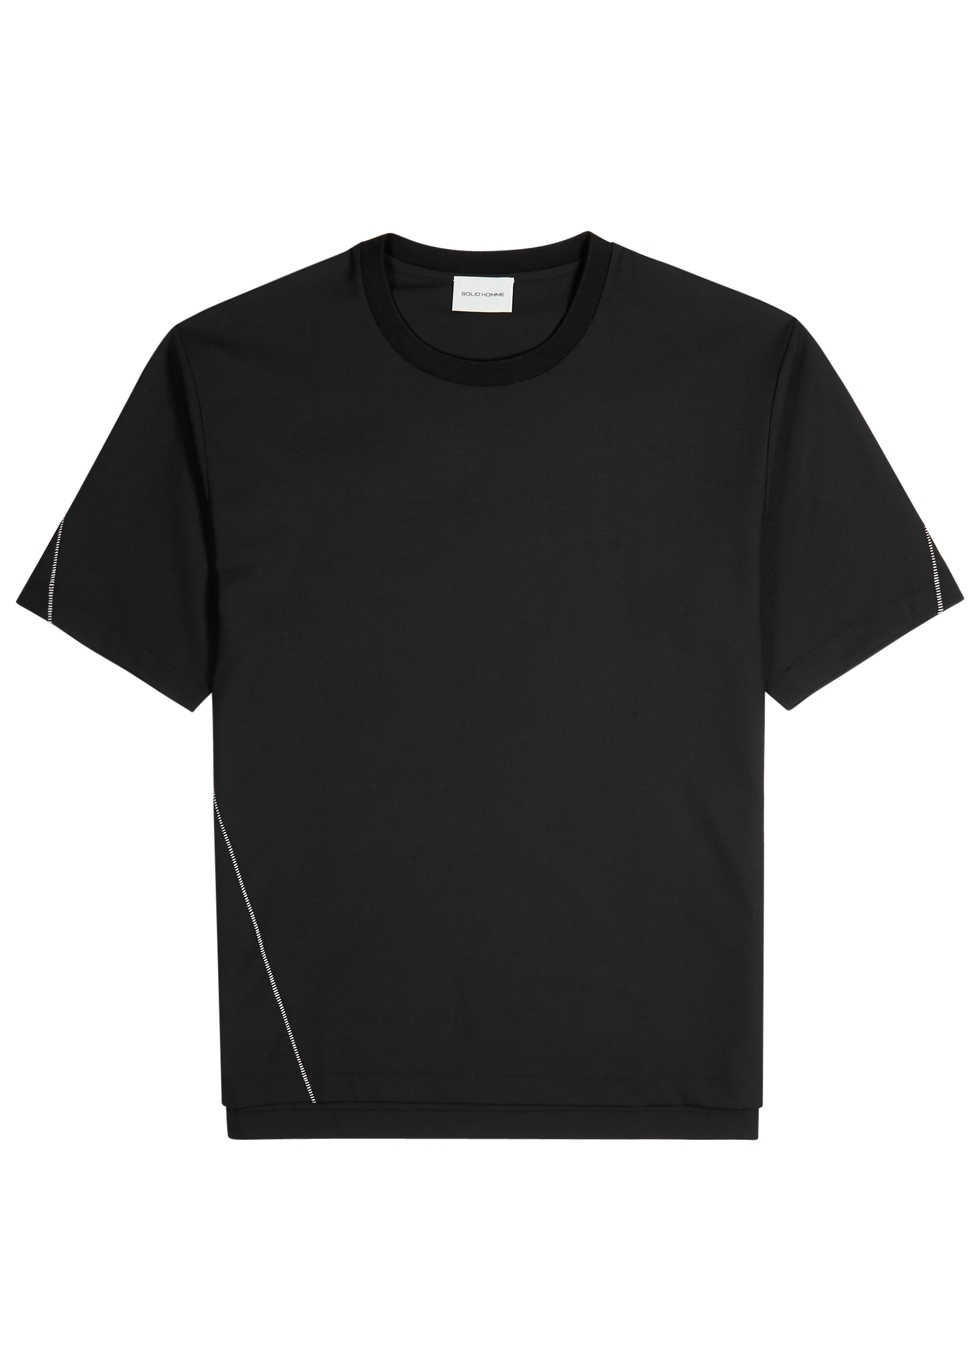 SOLID HOMME BLACK WOOL-BLEND T-SHIRT